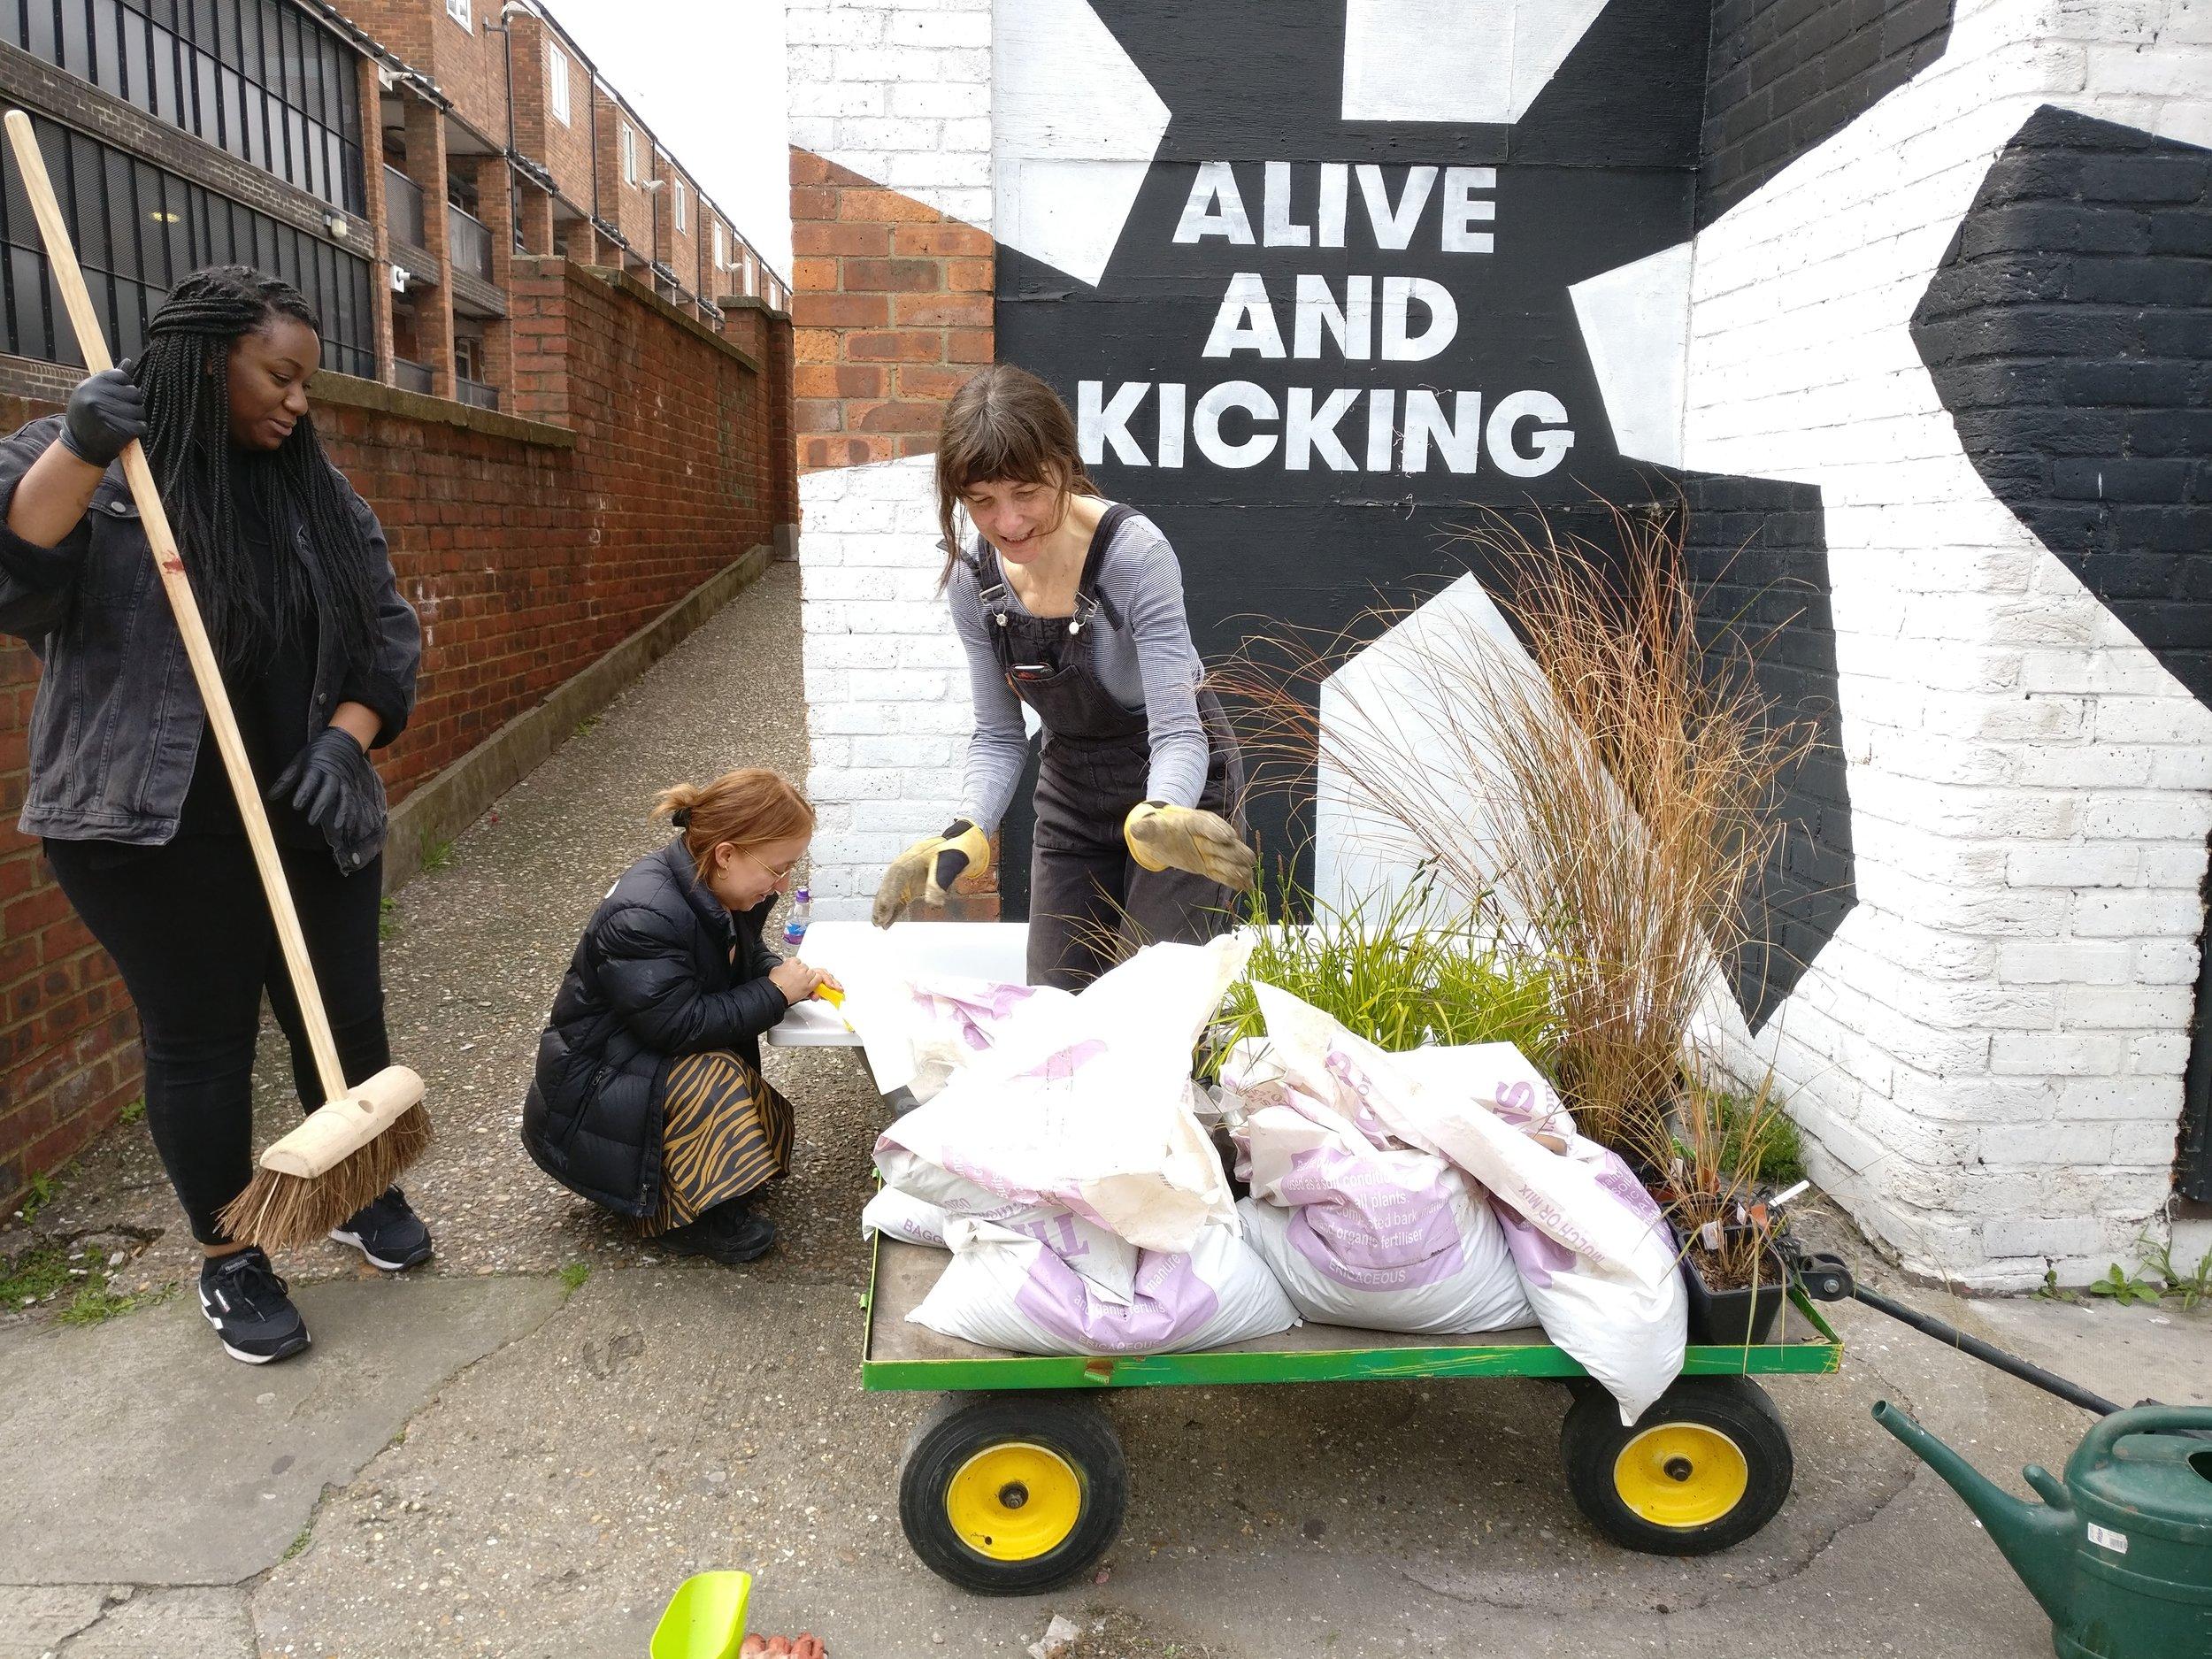 Planting at Alive and Kicking